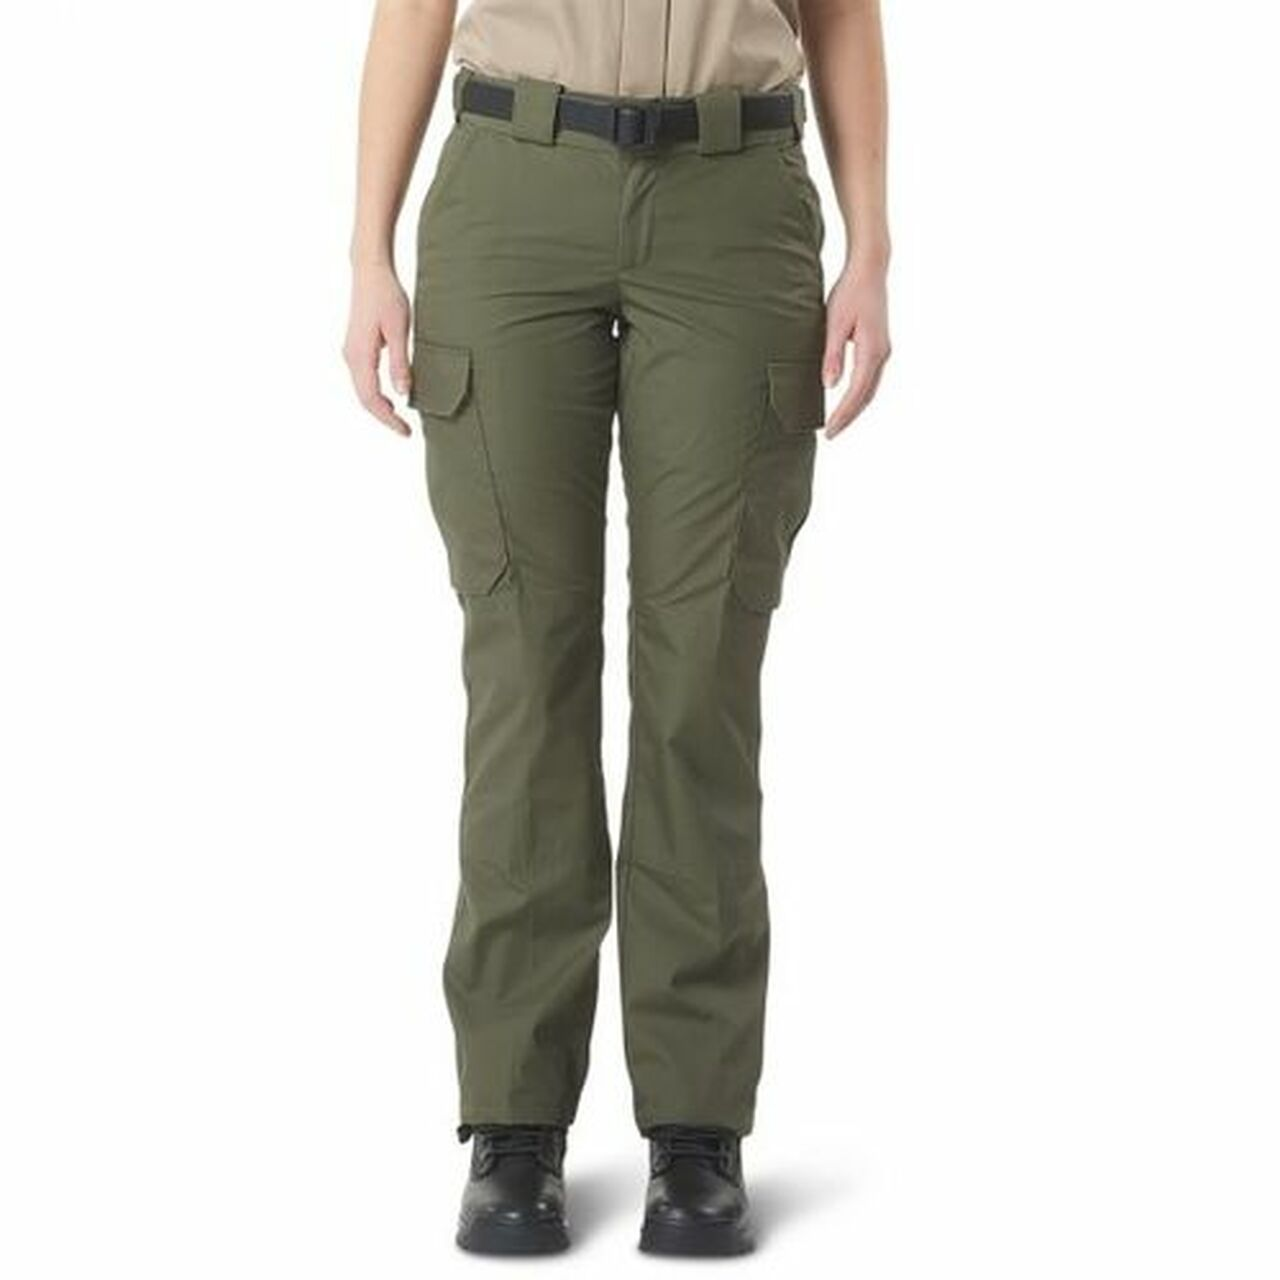 5.11 Tactical 64015US CDCR Women's Uniform Cargo Pants, Slim/Athletic Fit, Polyester/Cotton, Green